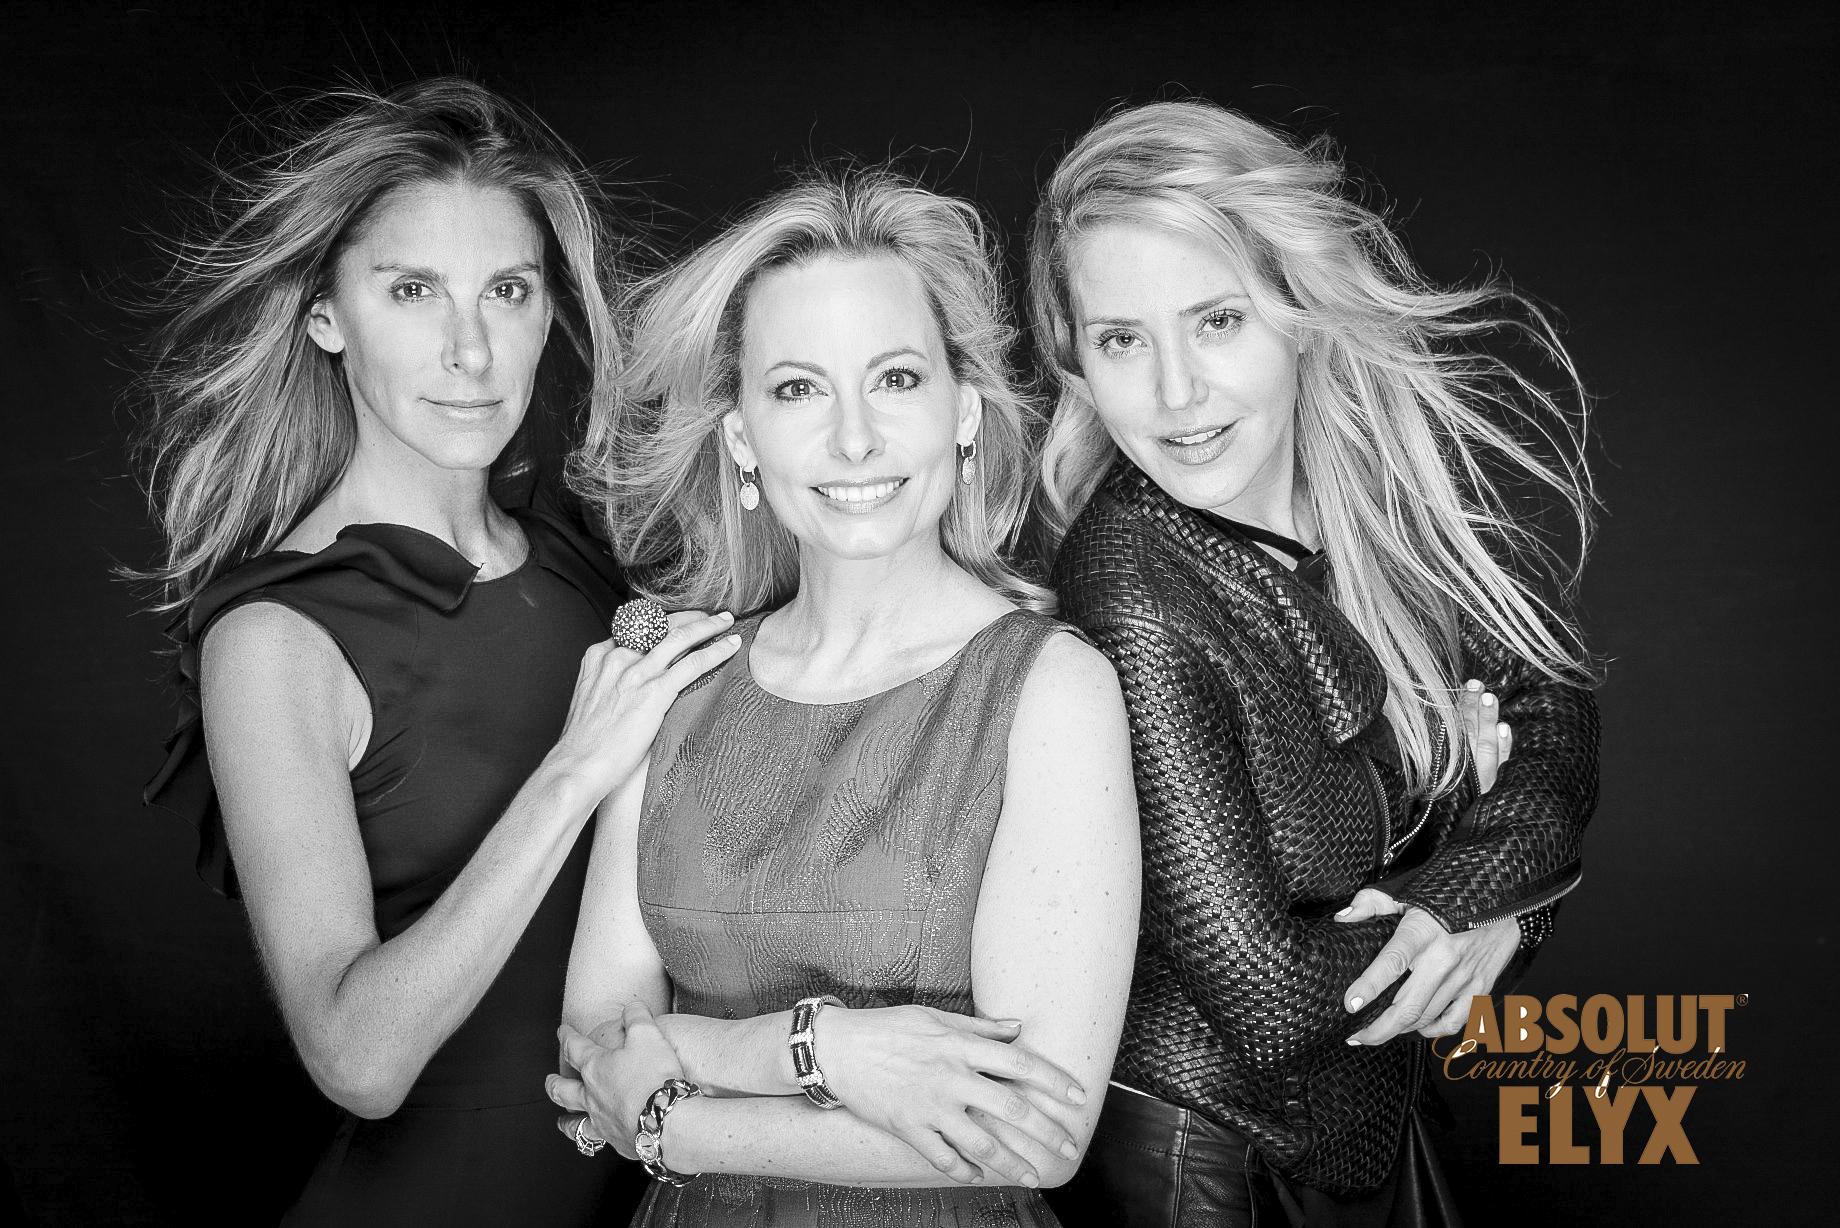 Black and White Portrait of Three Blonde Women on Black Background